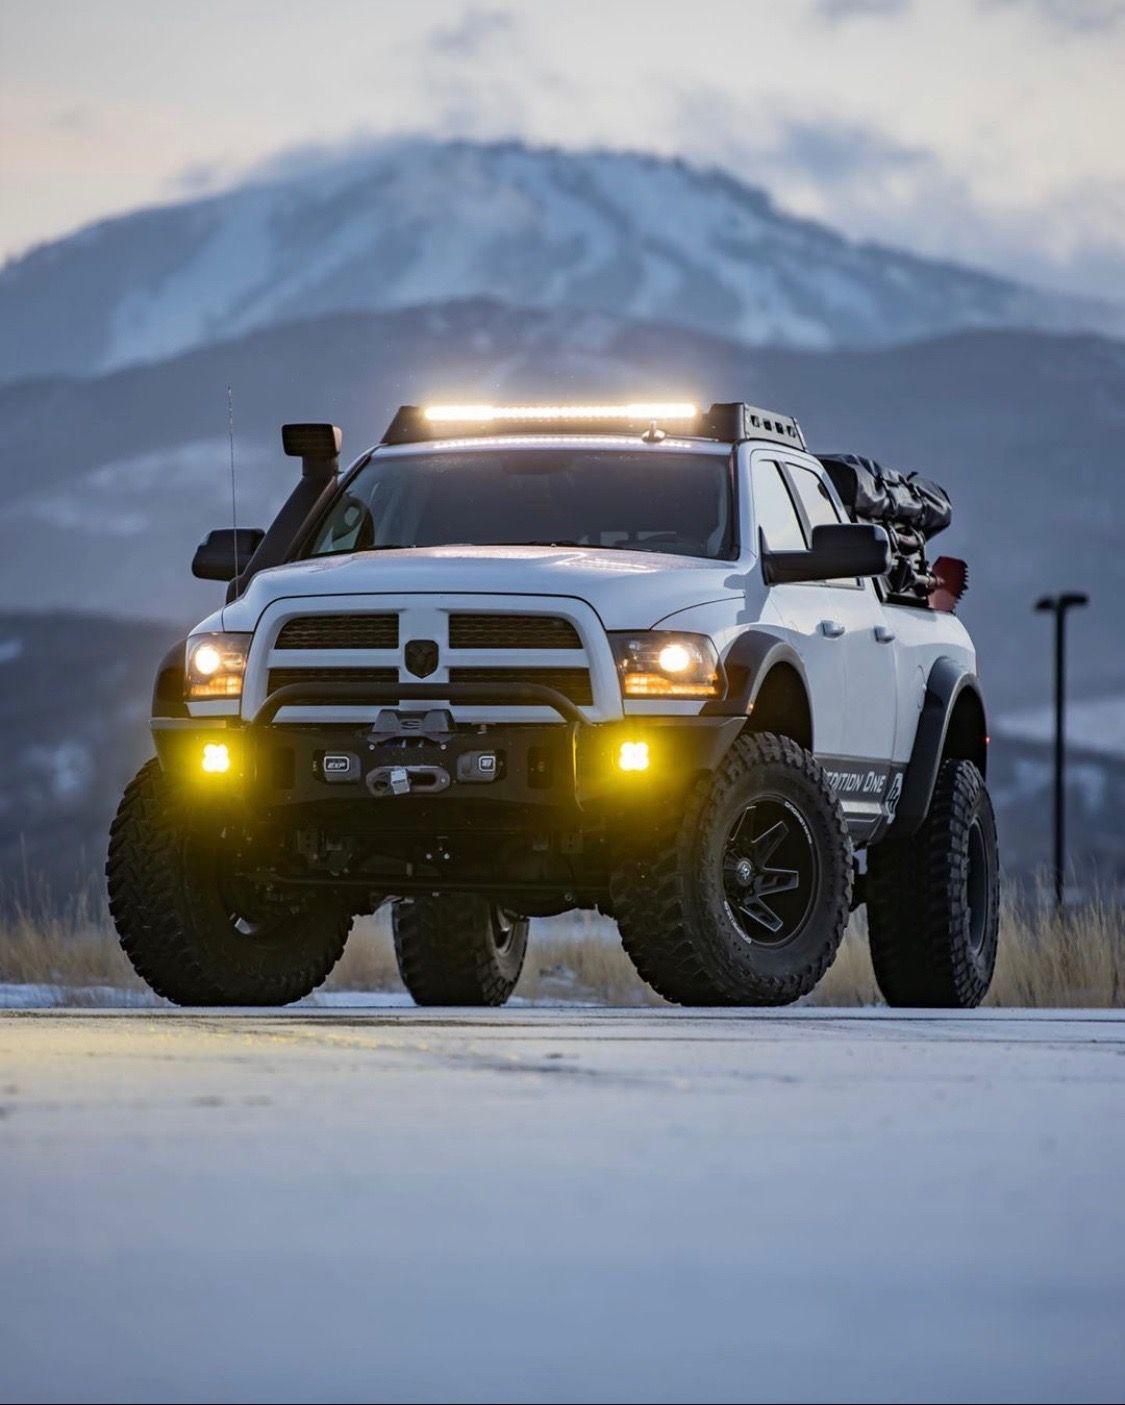 Ram 2500 Aev Prospector Xl Dodge Trucks Dodge Trucks Ram Ram Trucks